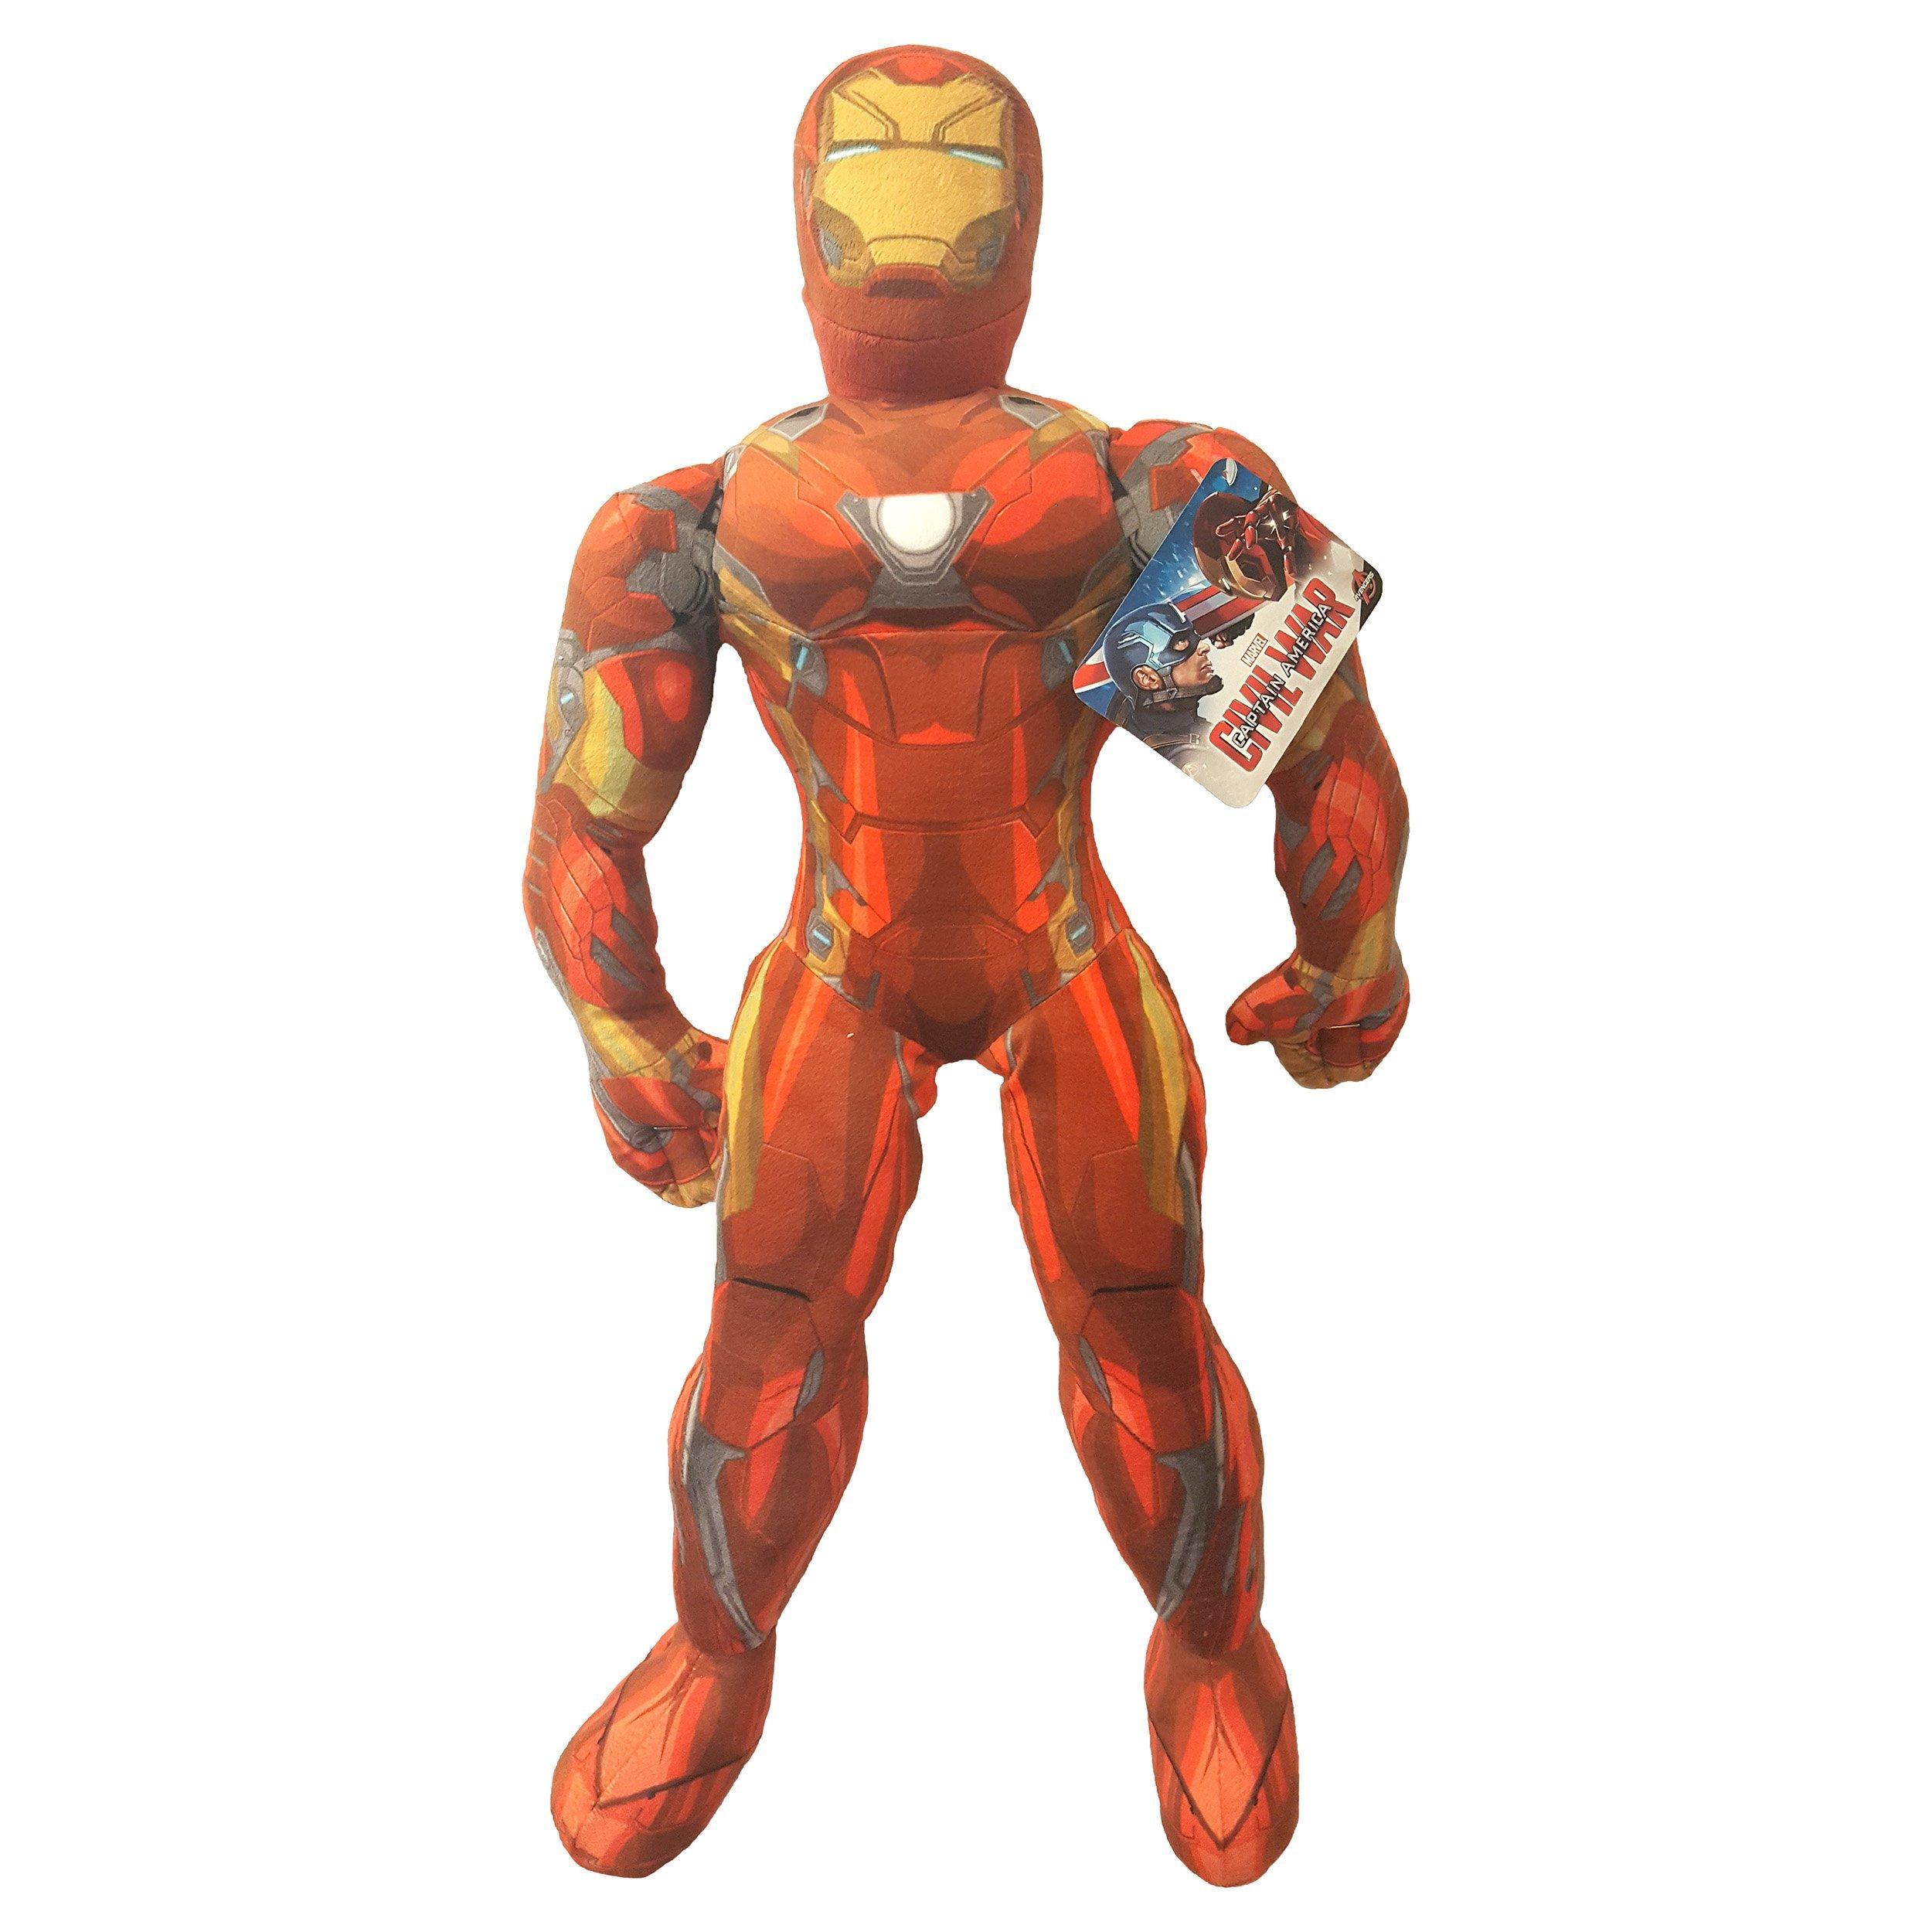 Marvel Captain America Civil War Movie Iron Man Plush Pillow Buddy